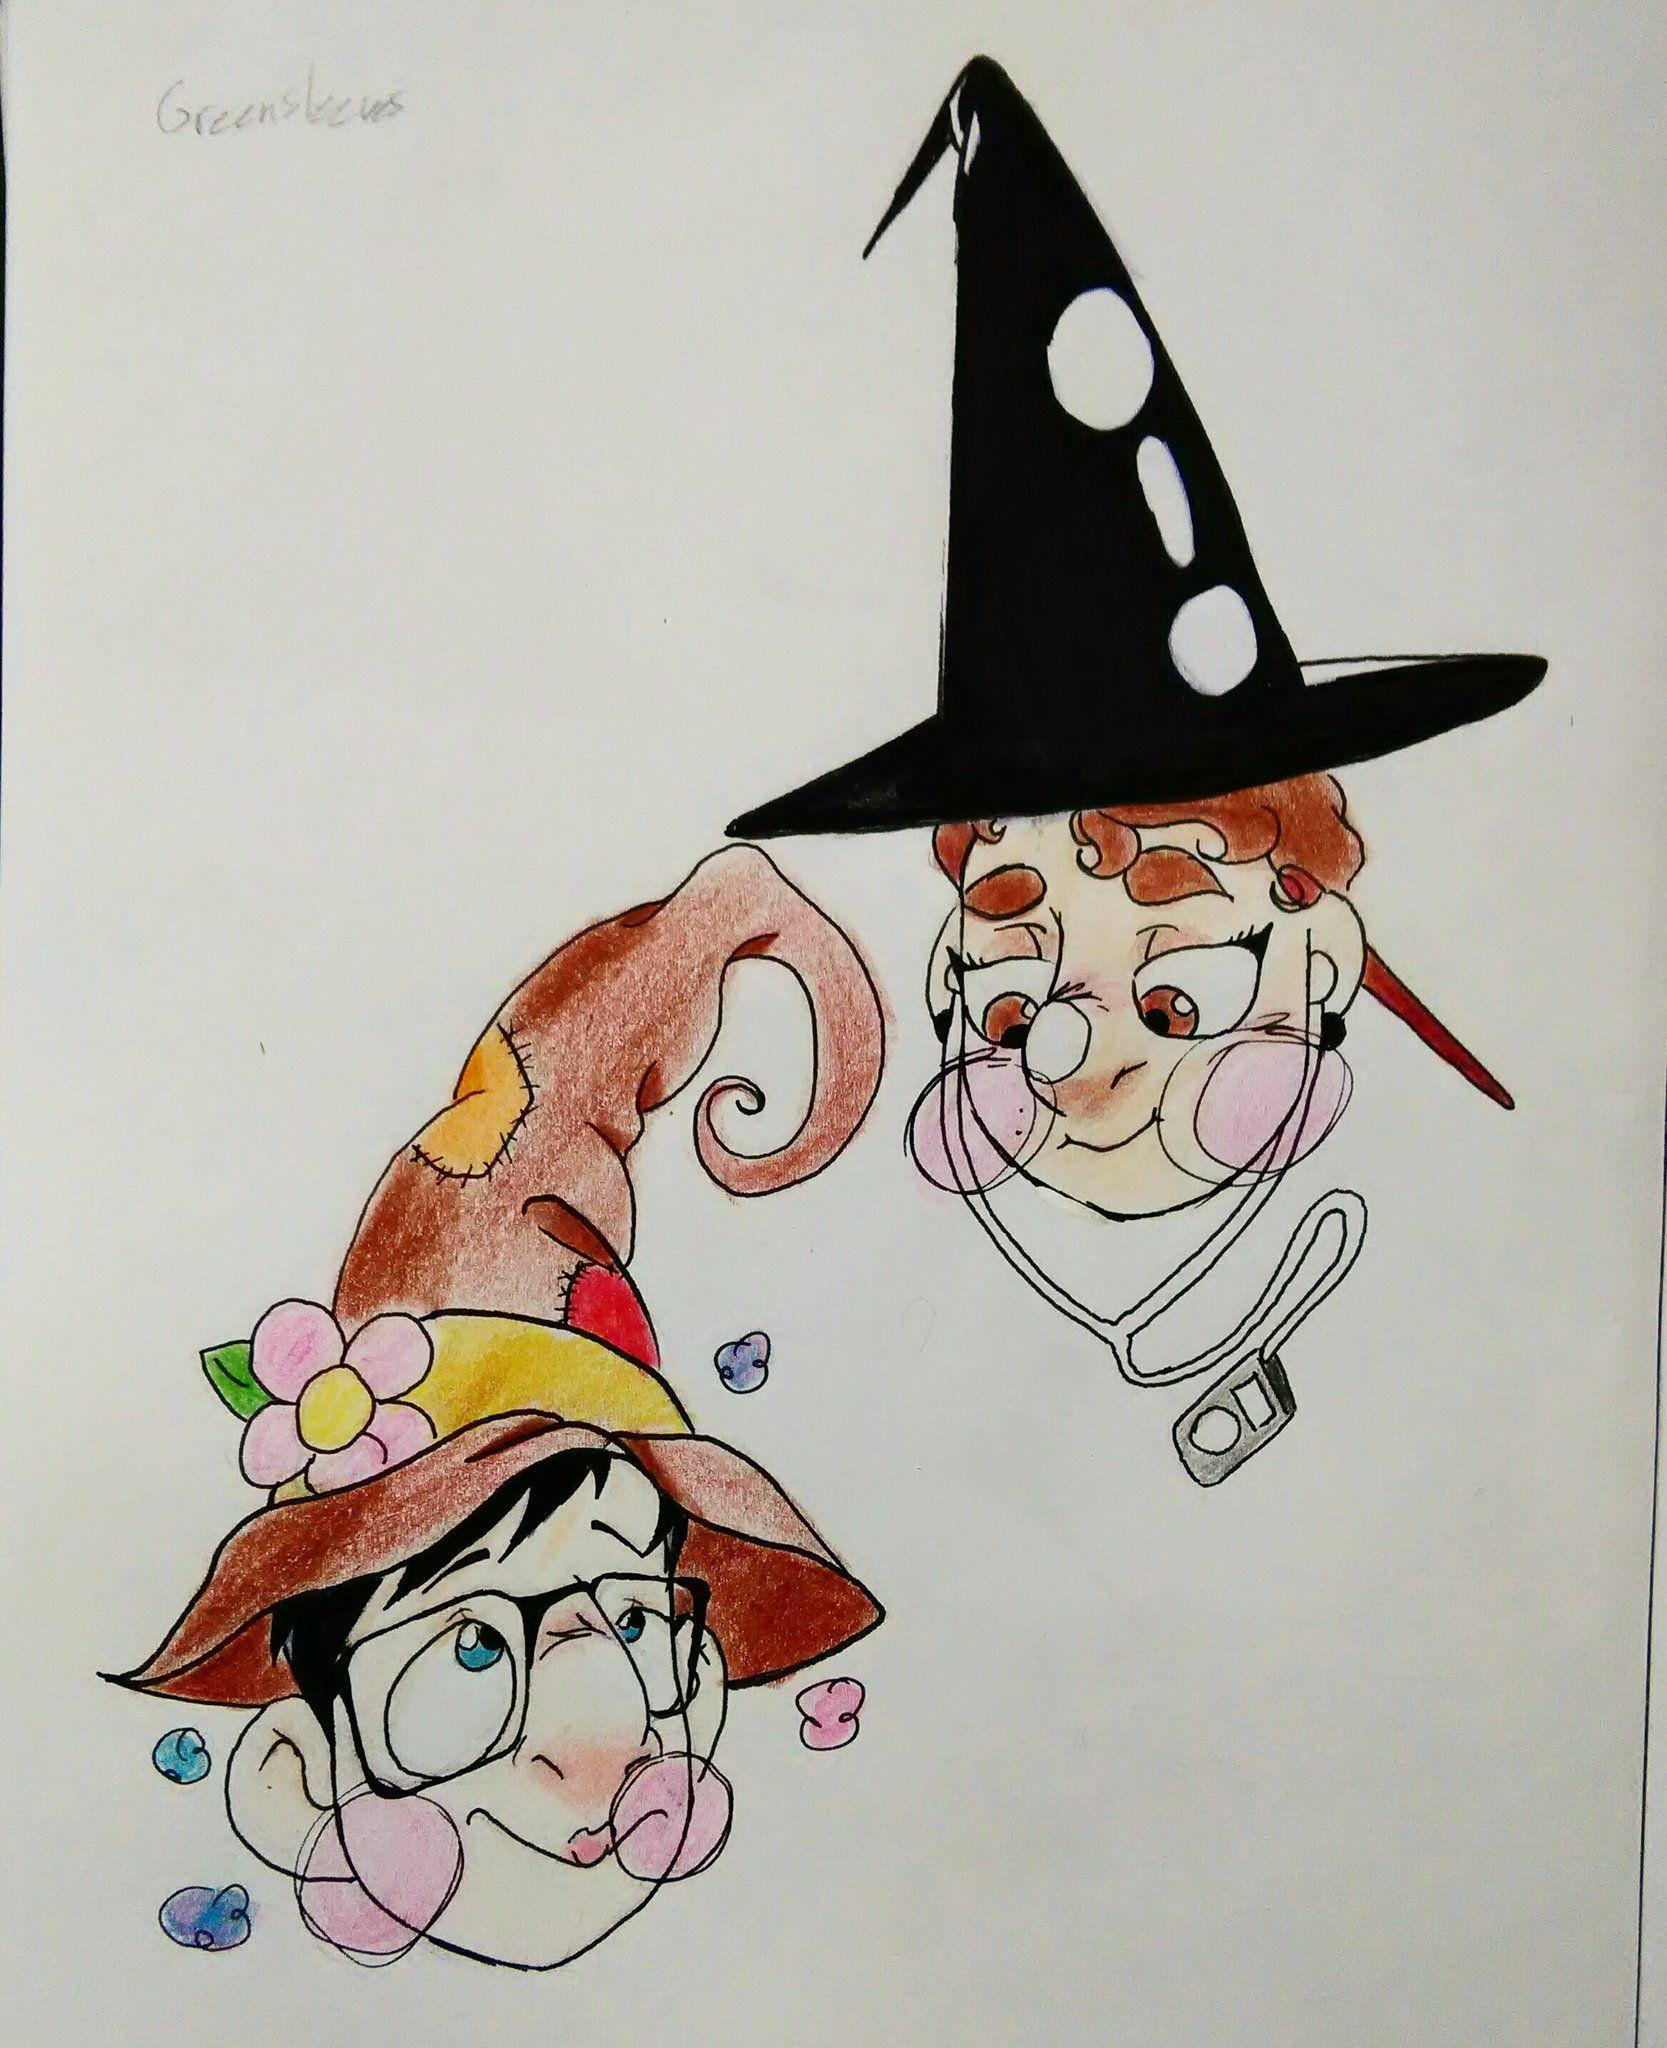 "Harlequin Sky Fisher on Twitter: ""Hufflepuff Phil and Slytherin Dan 2k17 #phanart #phan https://t.co/Sq7Gu7iCSa"""